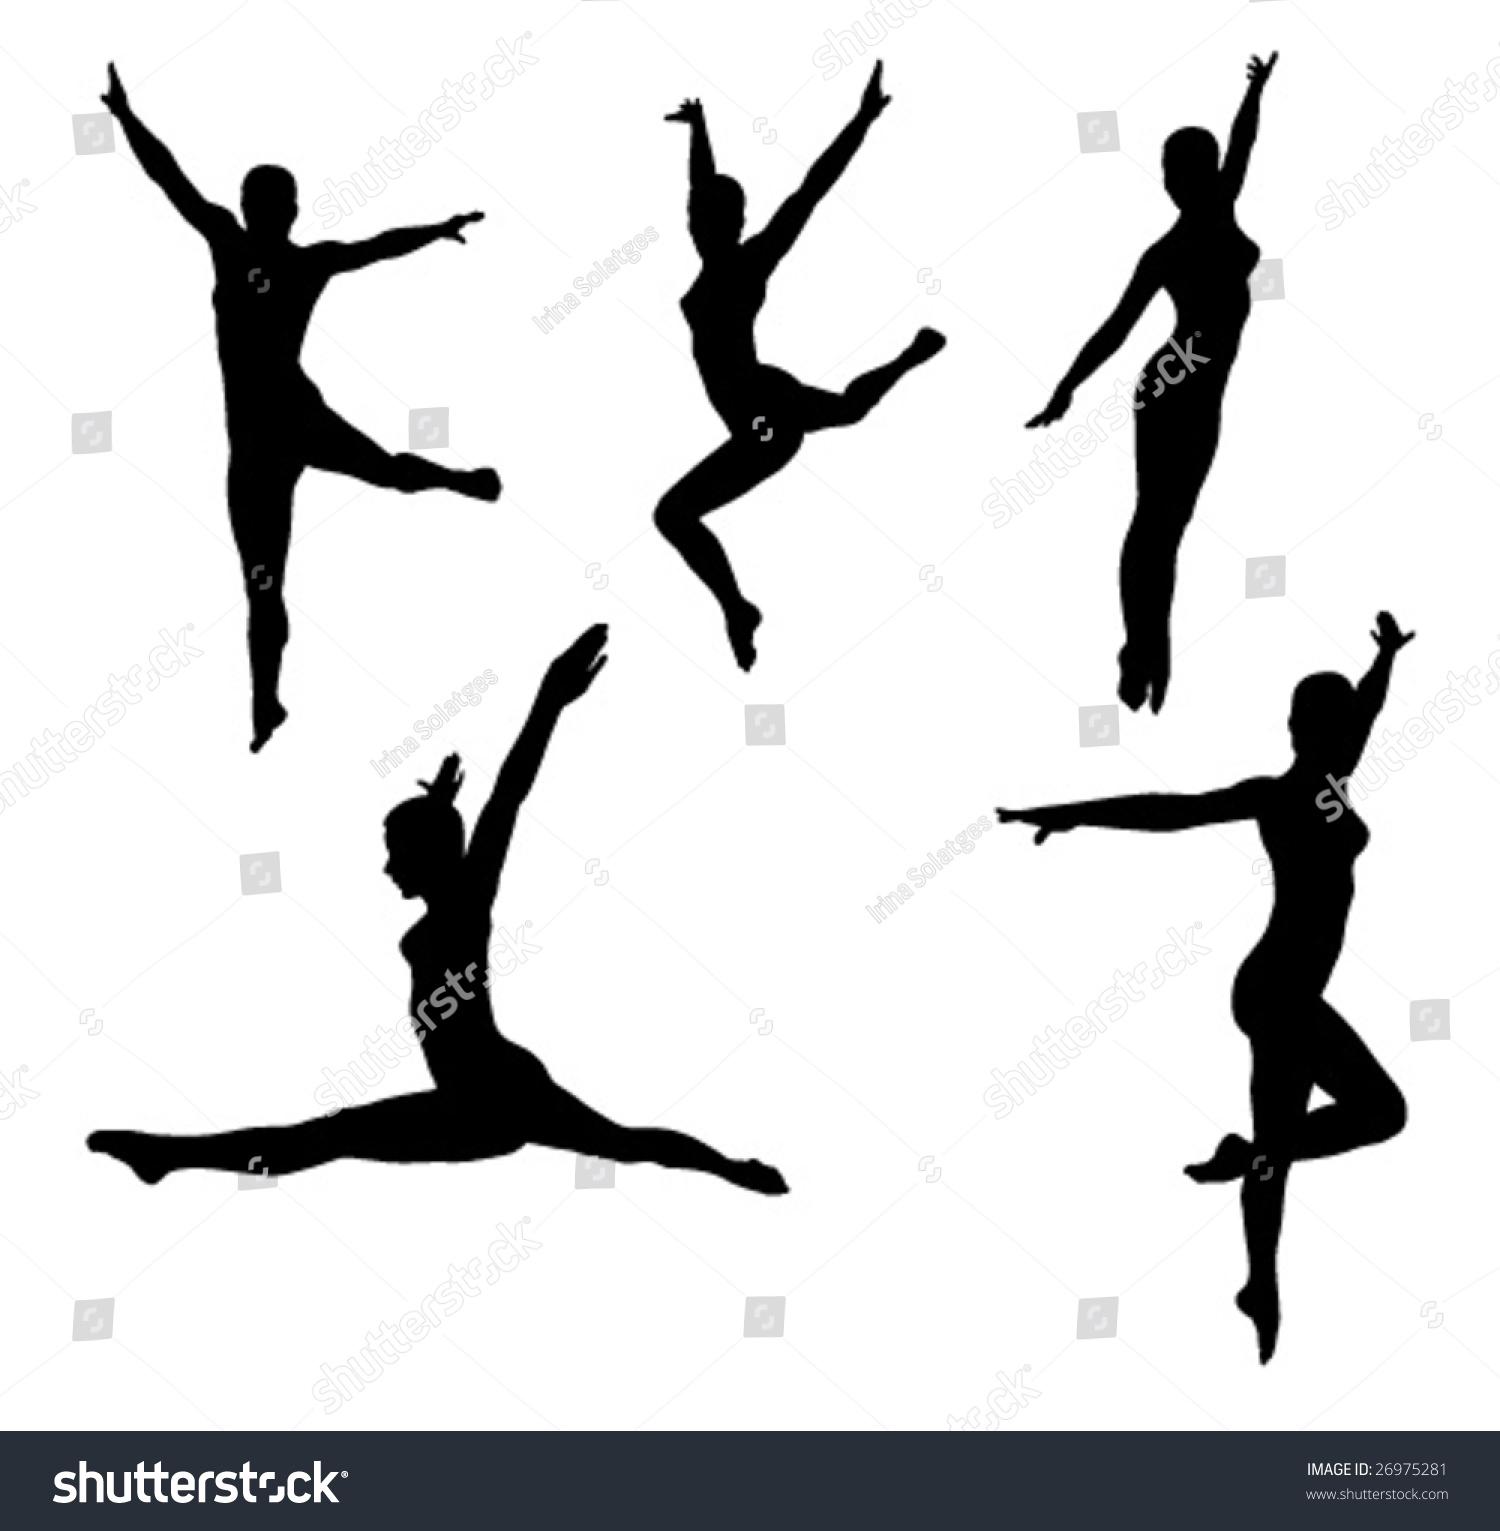 Teal Silhouette Backround Dancer